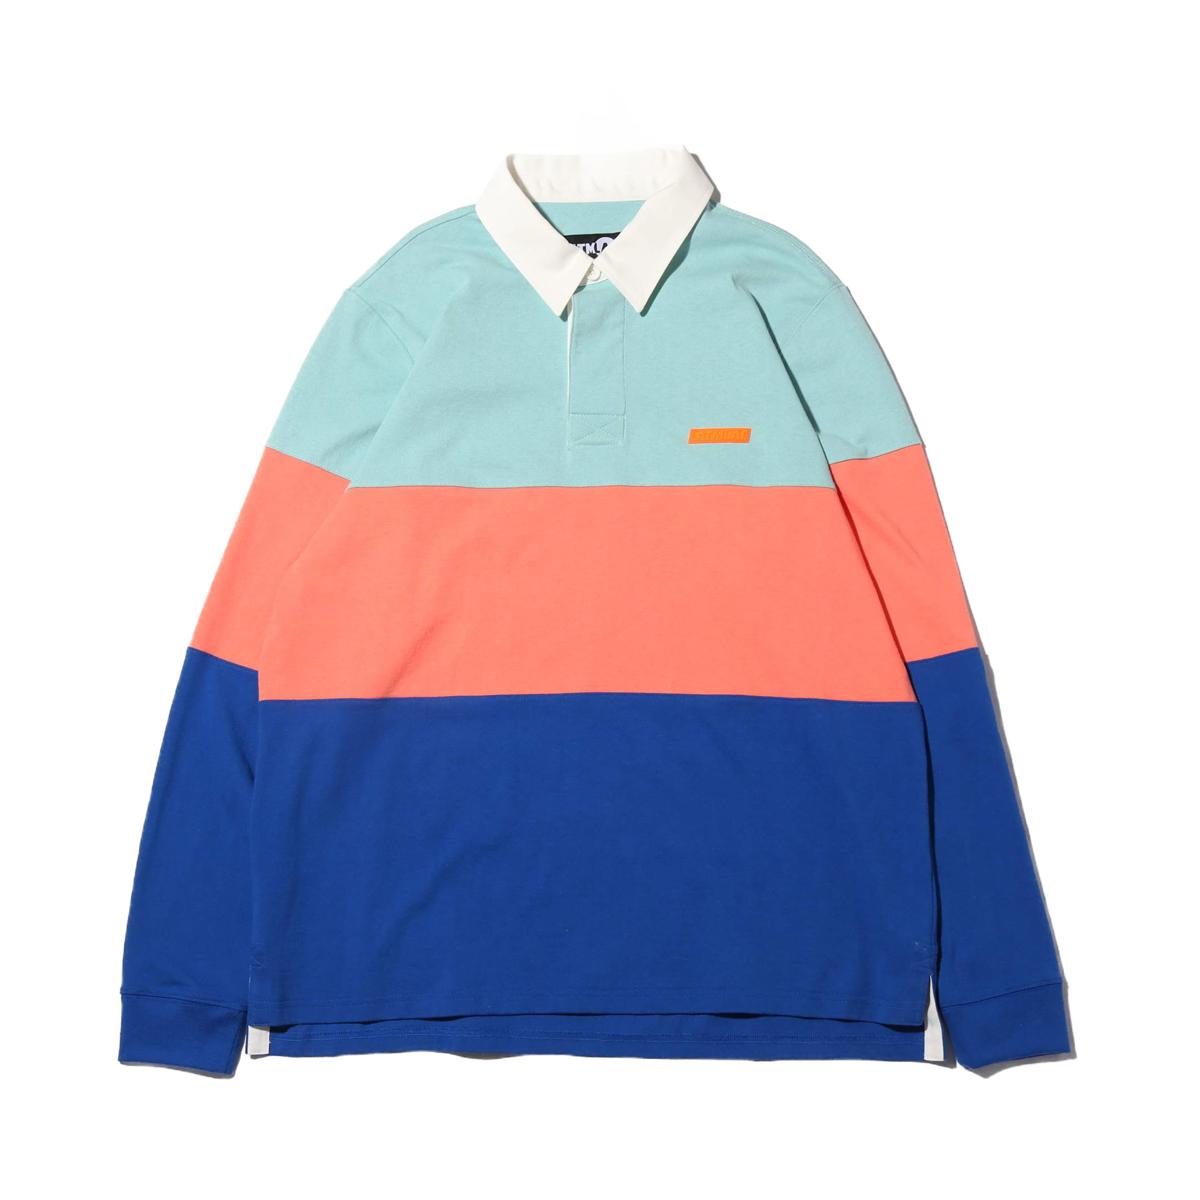 ATMOS LAB RUGBY SHIRT(BLUE)(アトモスラボ ラグビー シャツ)【メンズ】【長袖Tシャツ】【19SP-I】